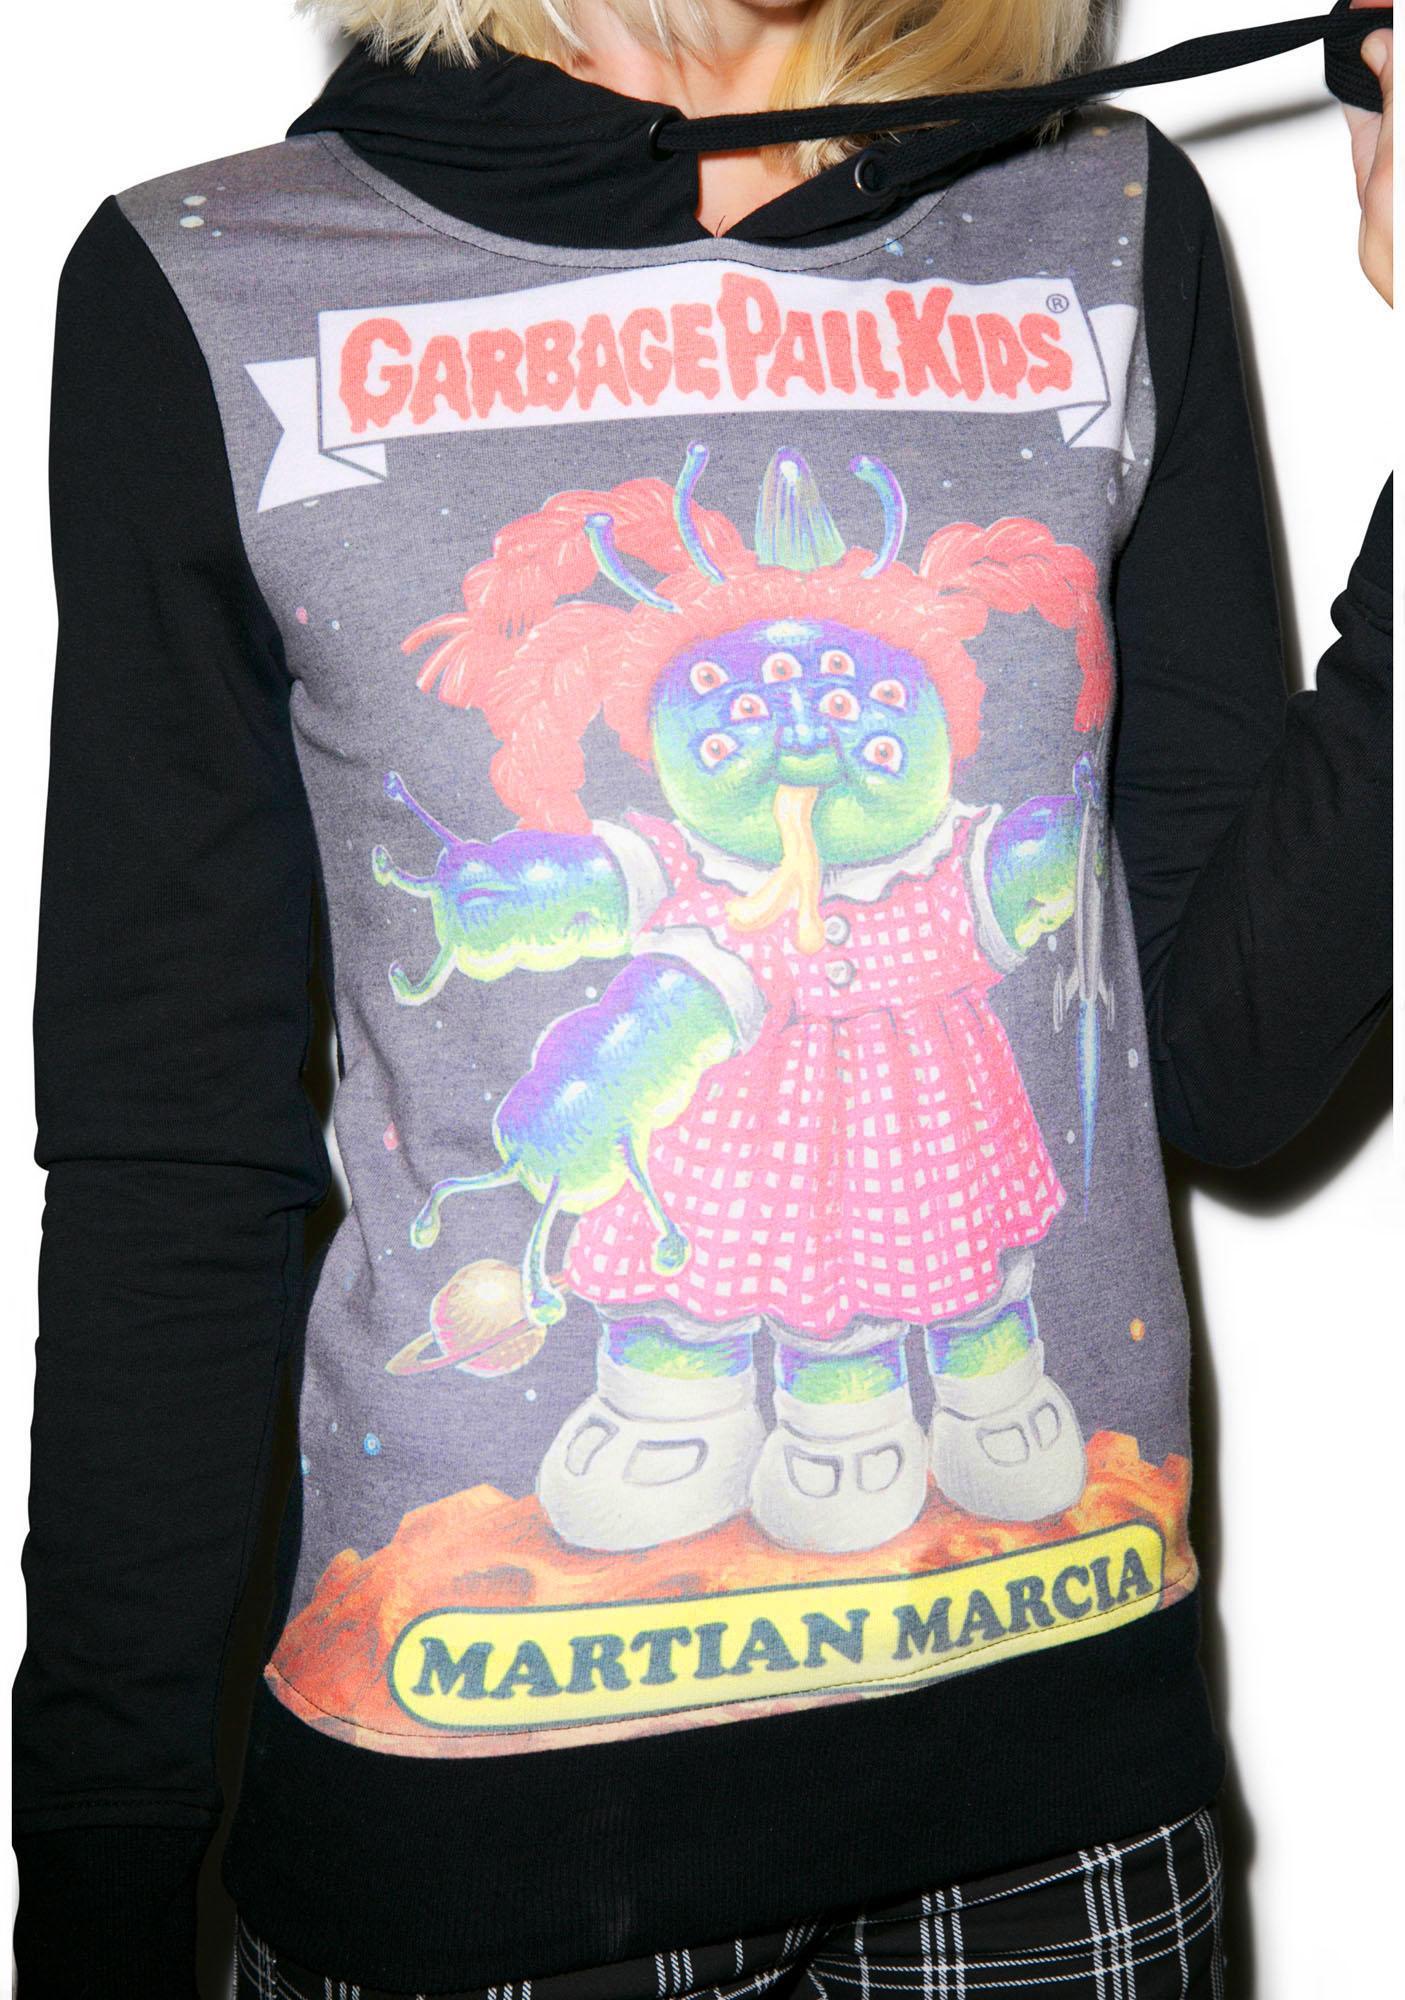 Iron Fist Garbage Pail Kids Martian Marcia Hoodie